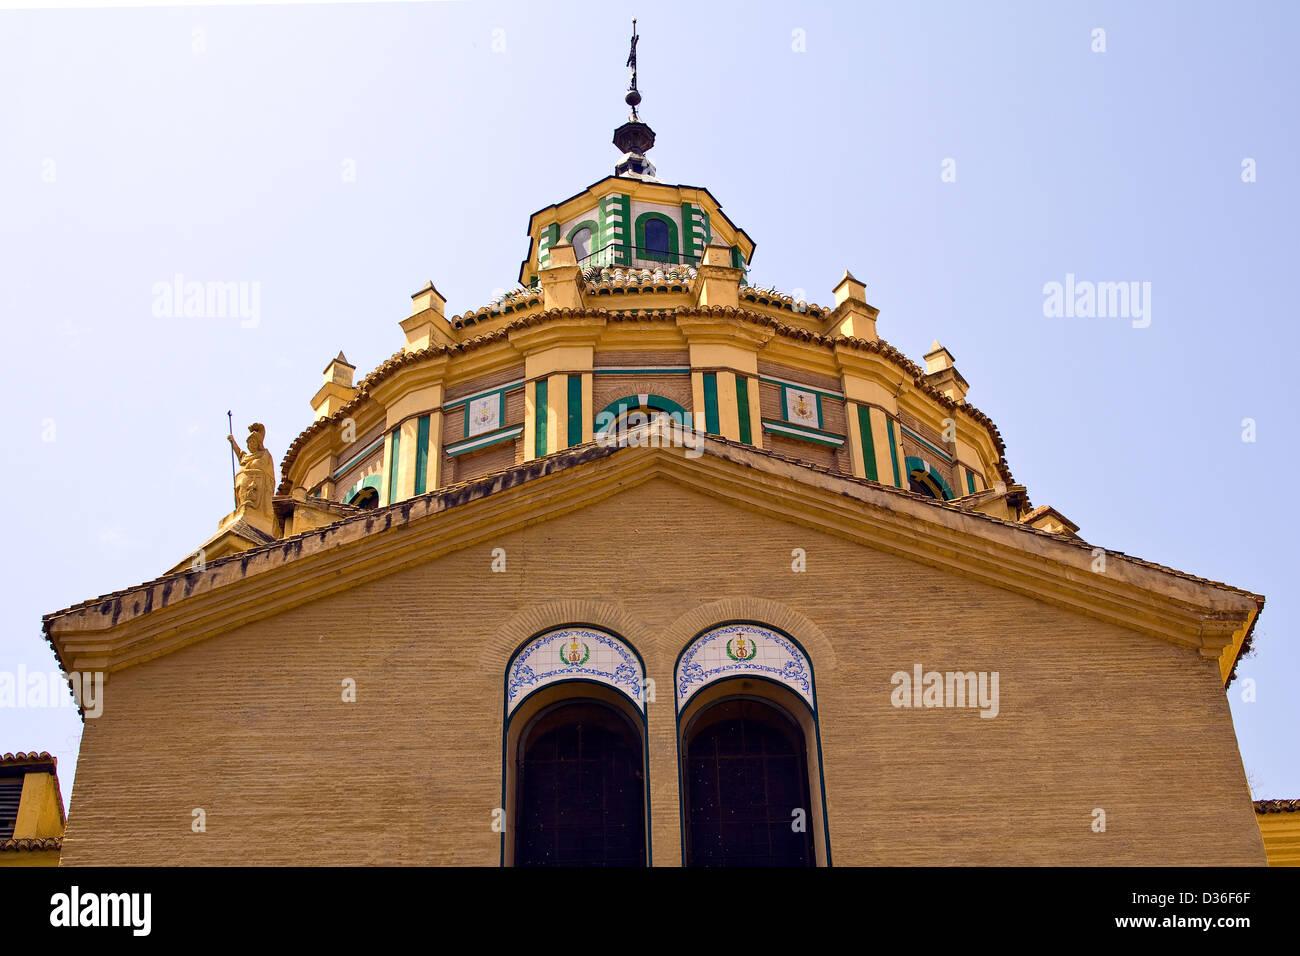 Tower of the hospital Church of San Juan de Dios in Granada, Andalucia, Spain - Stock Image